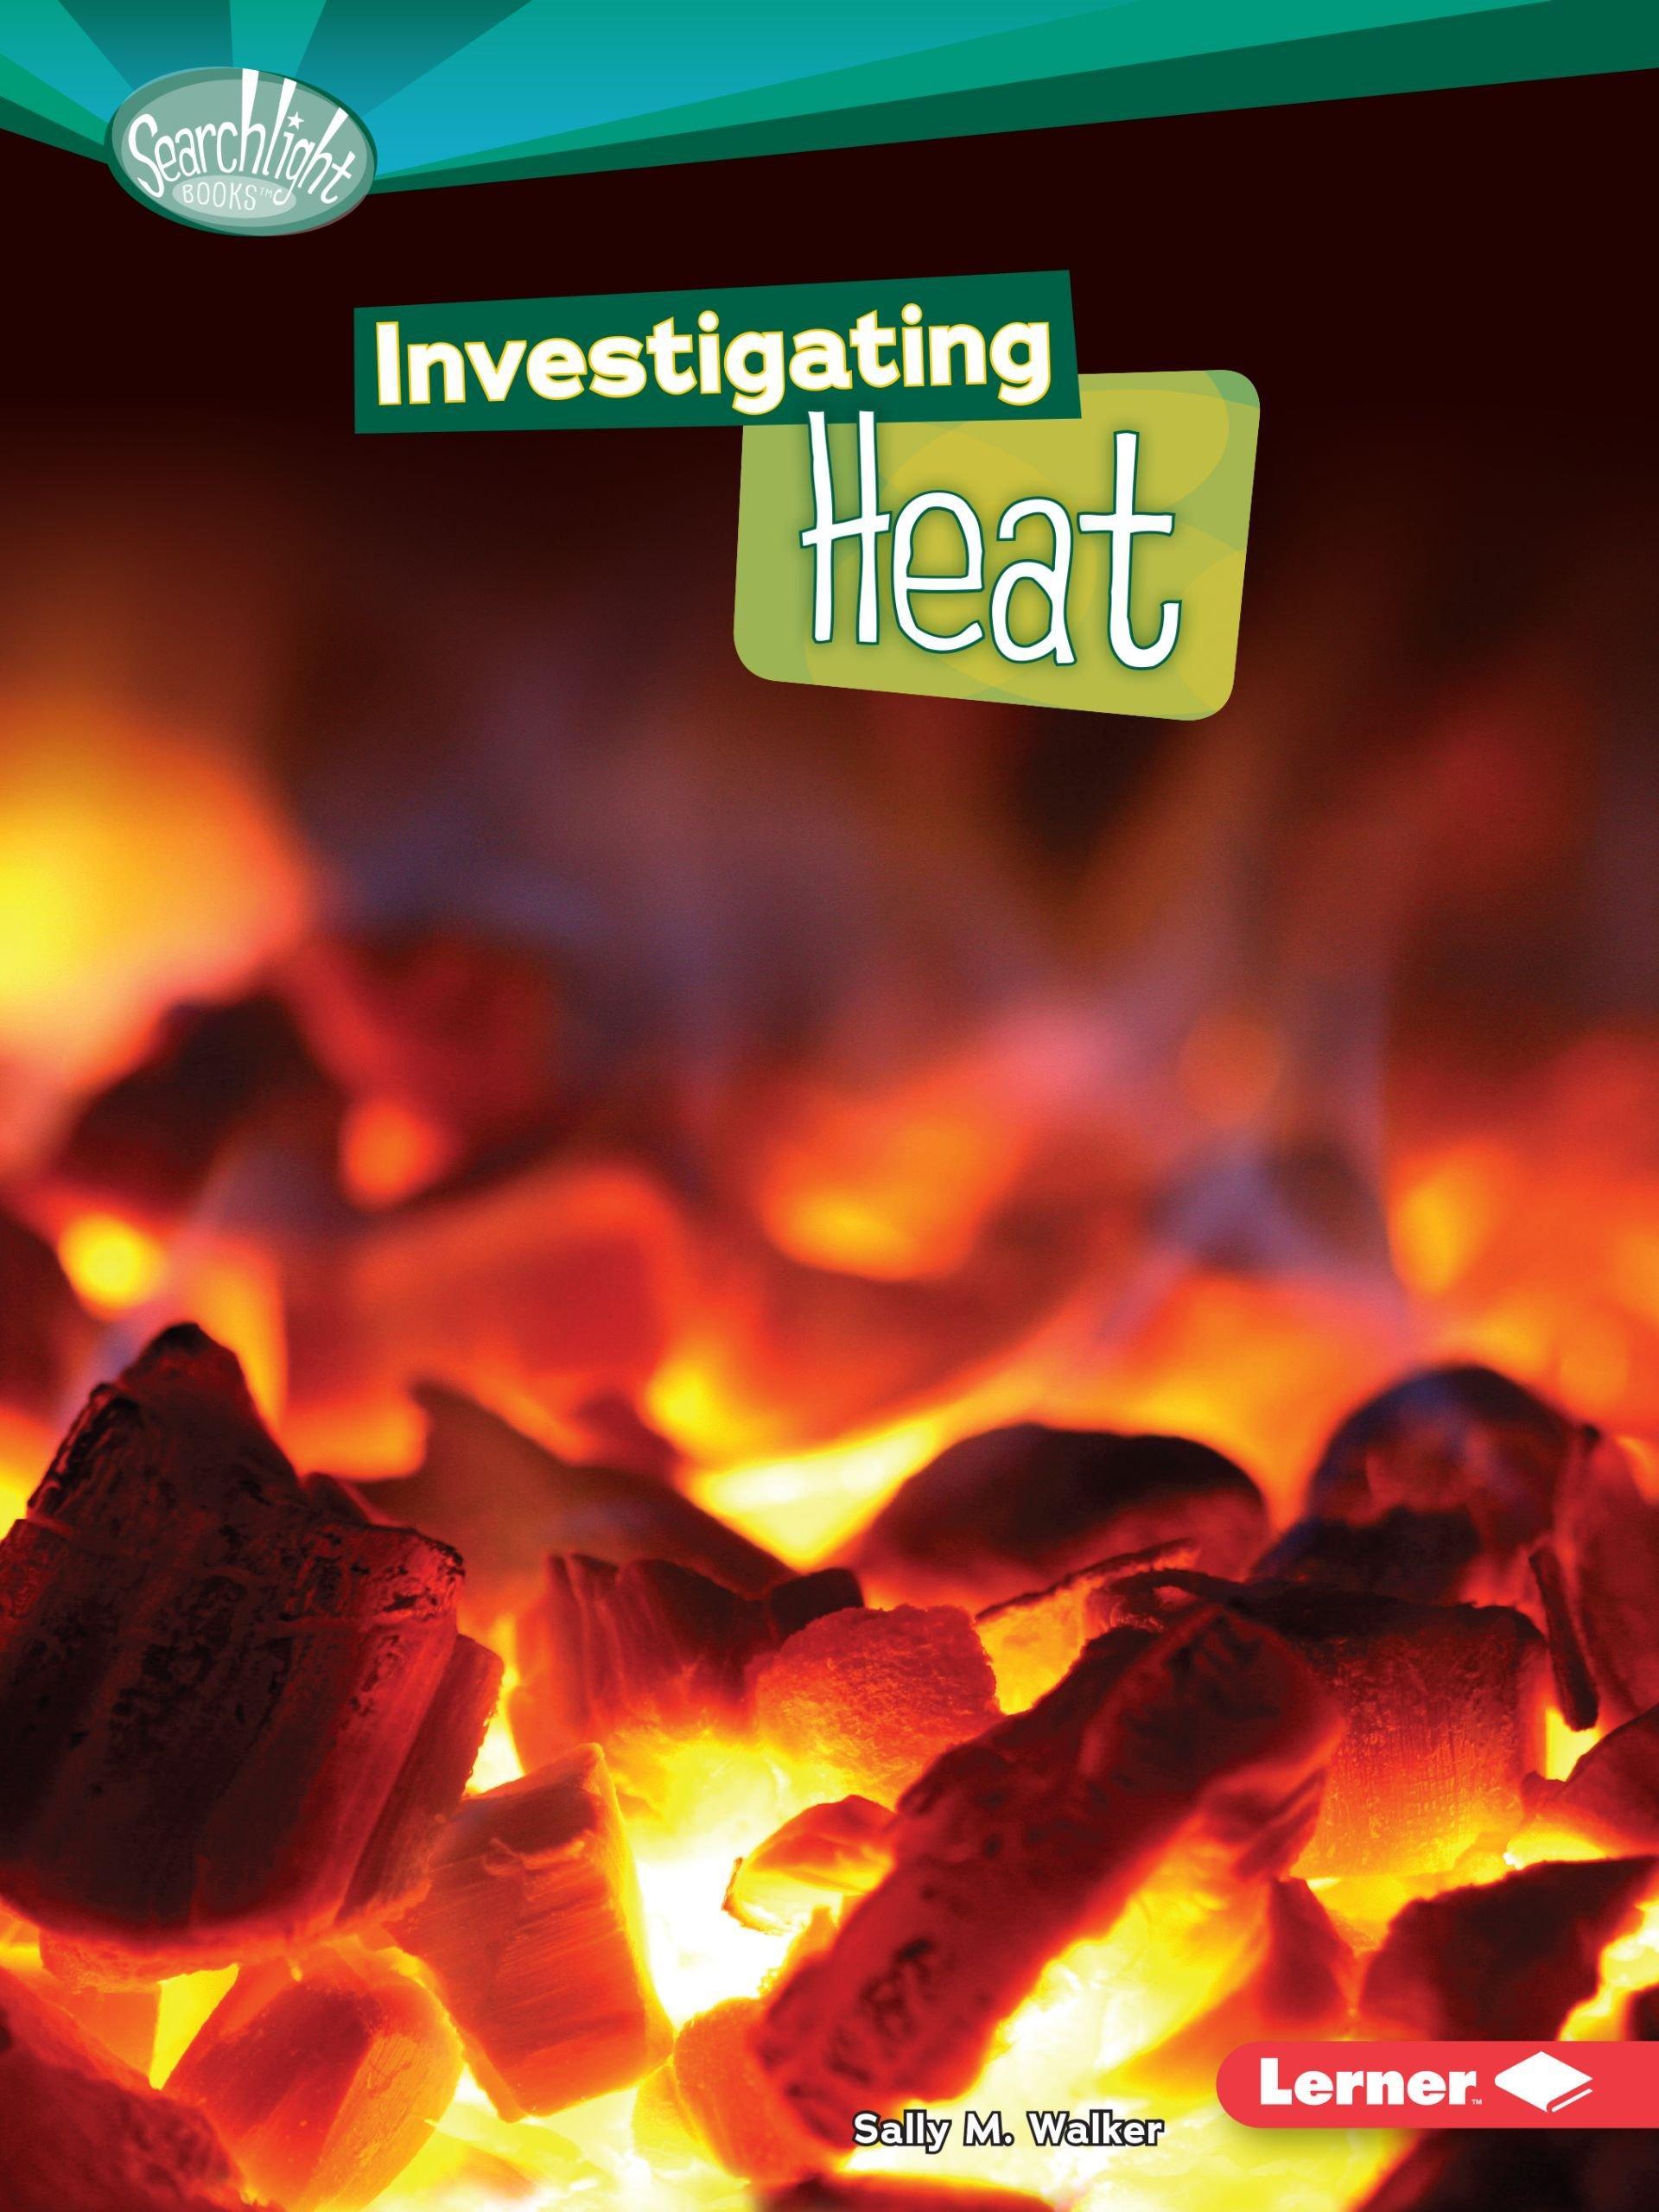 Investigating Heat (Searchlight Books)